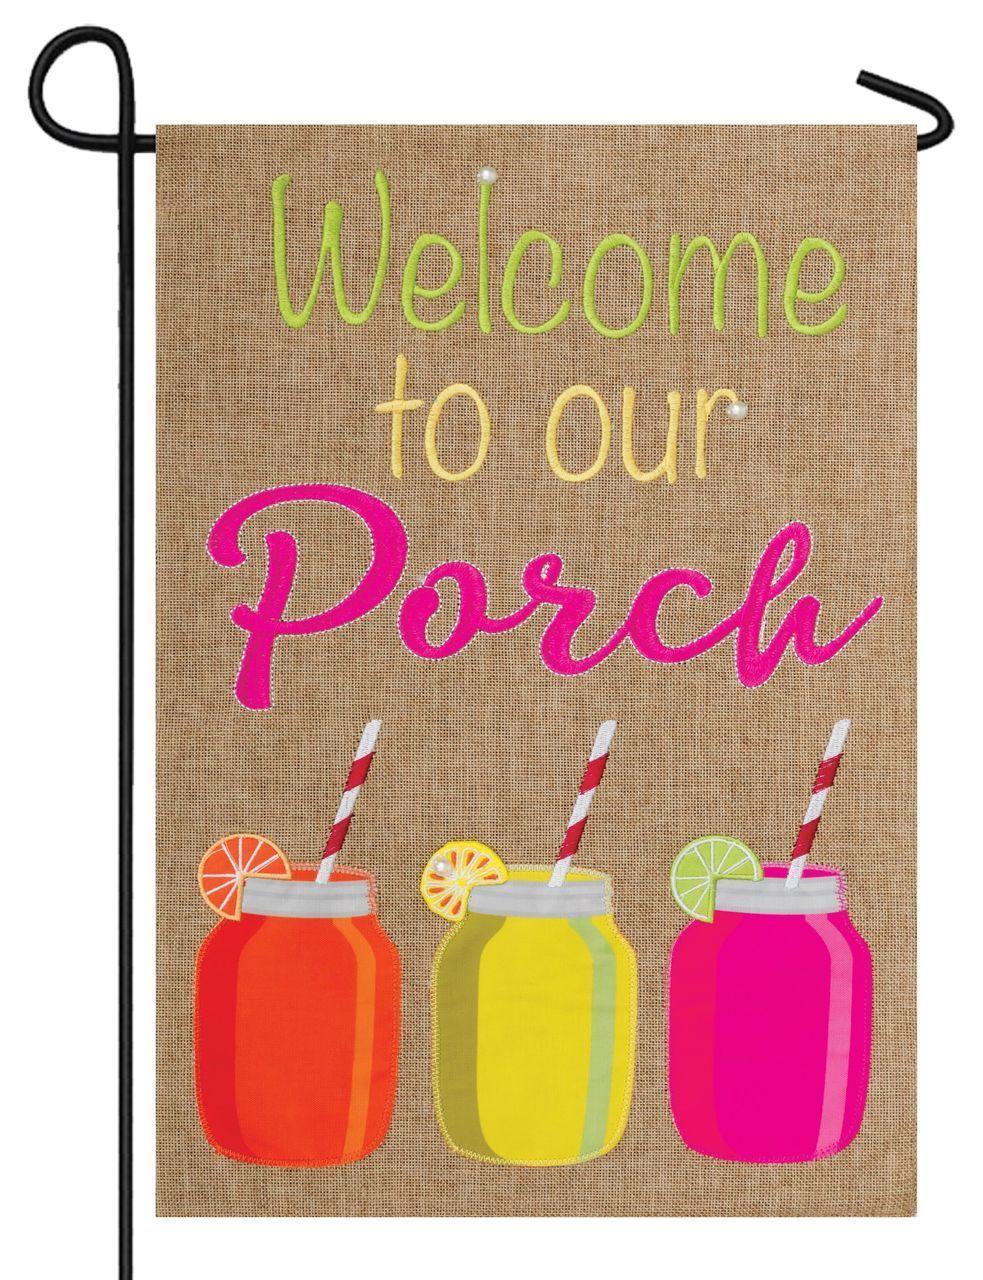 Burlap Welcome to Our Porch Double Applique Garden Flag | Flags For ...